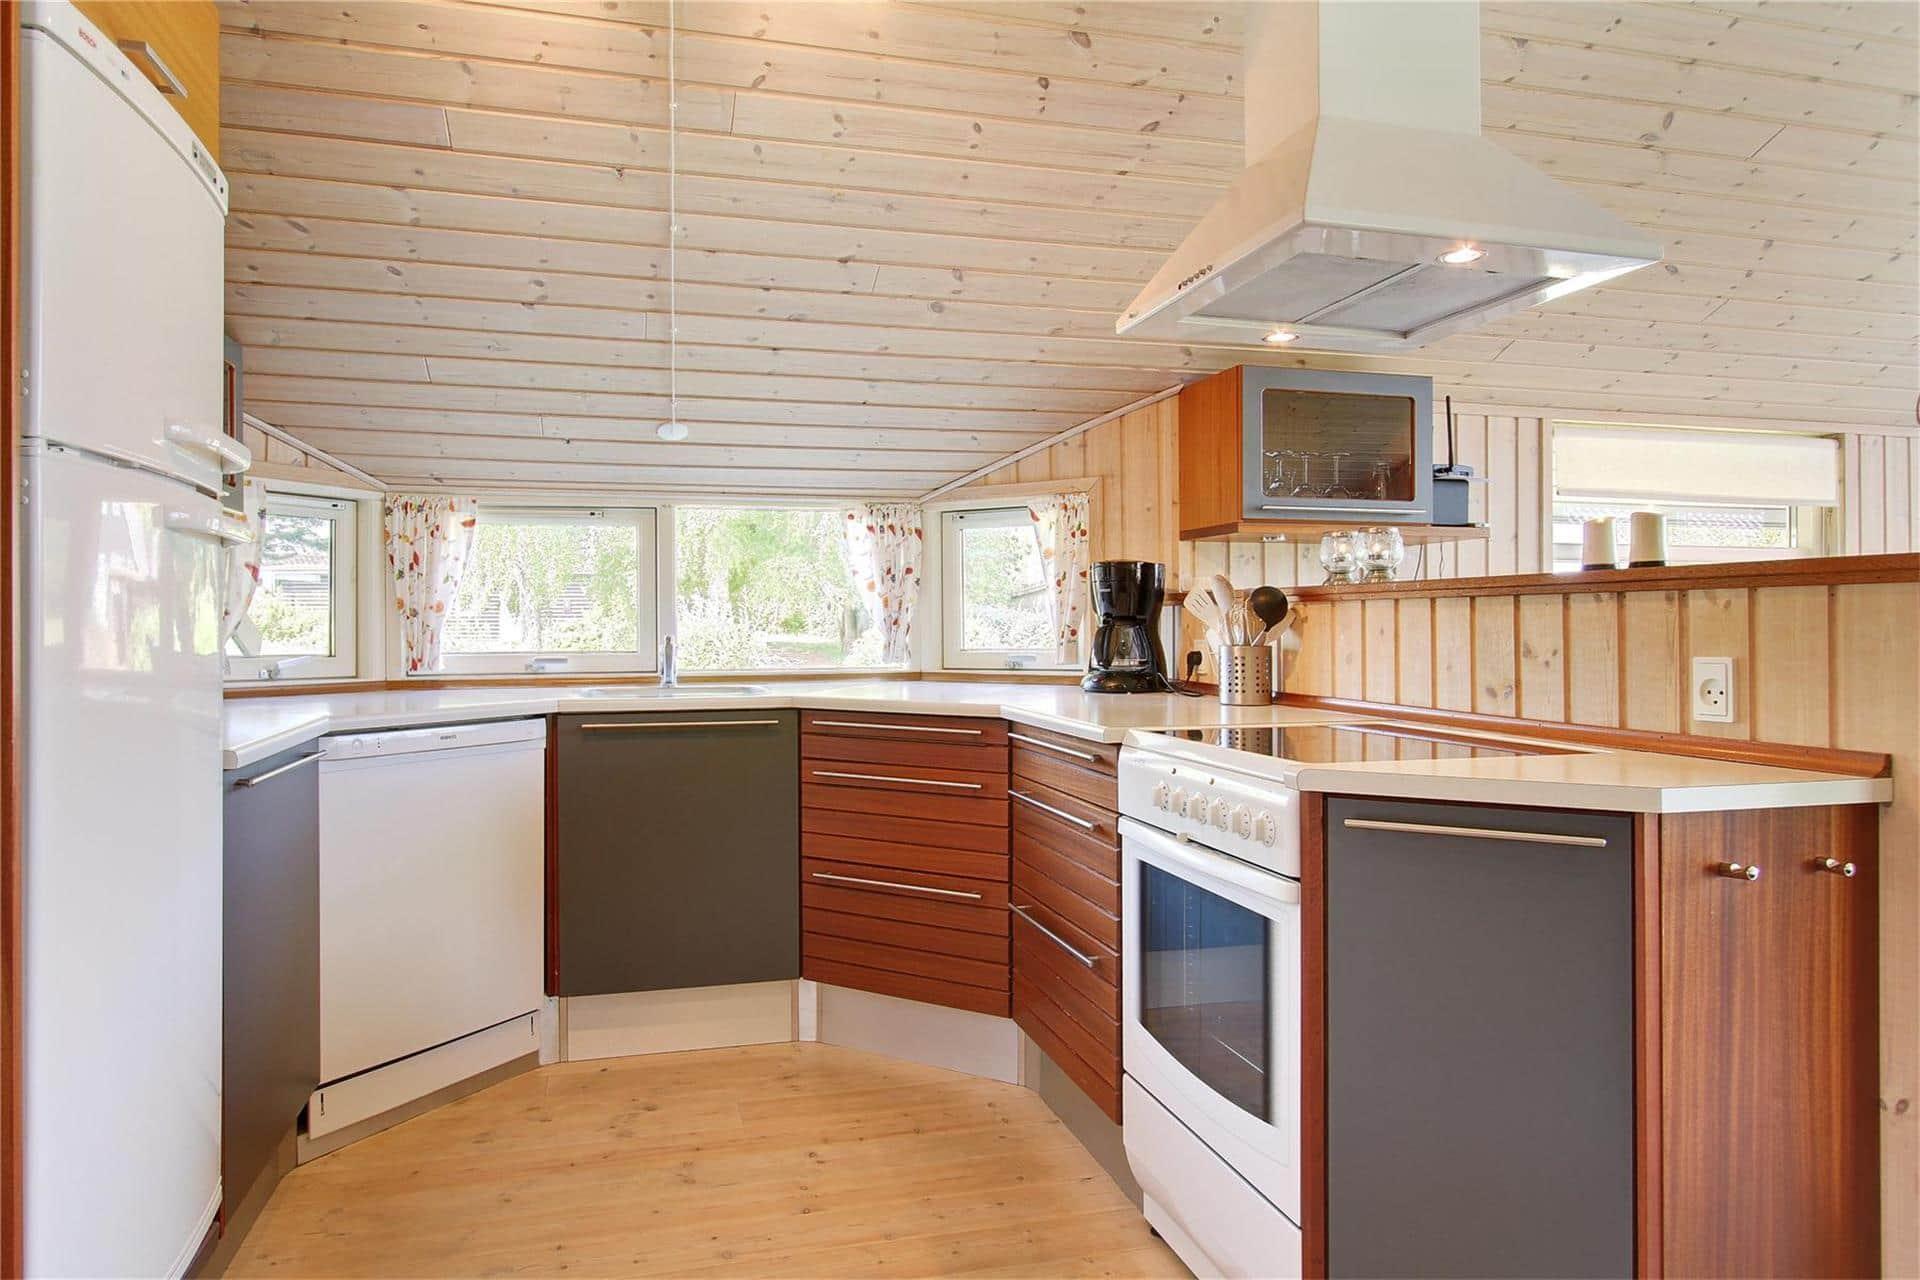 spahaus ferienhaus m64372 varbjerg bro strand nordwestf nen. Black Bedroom Furniture Sets. Home Design Ideas